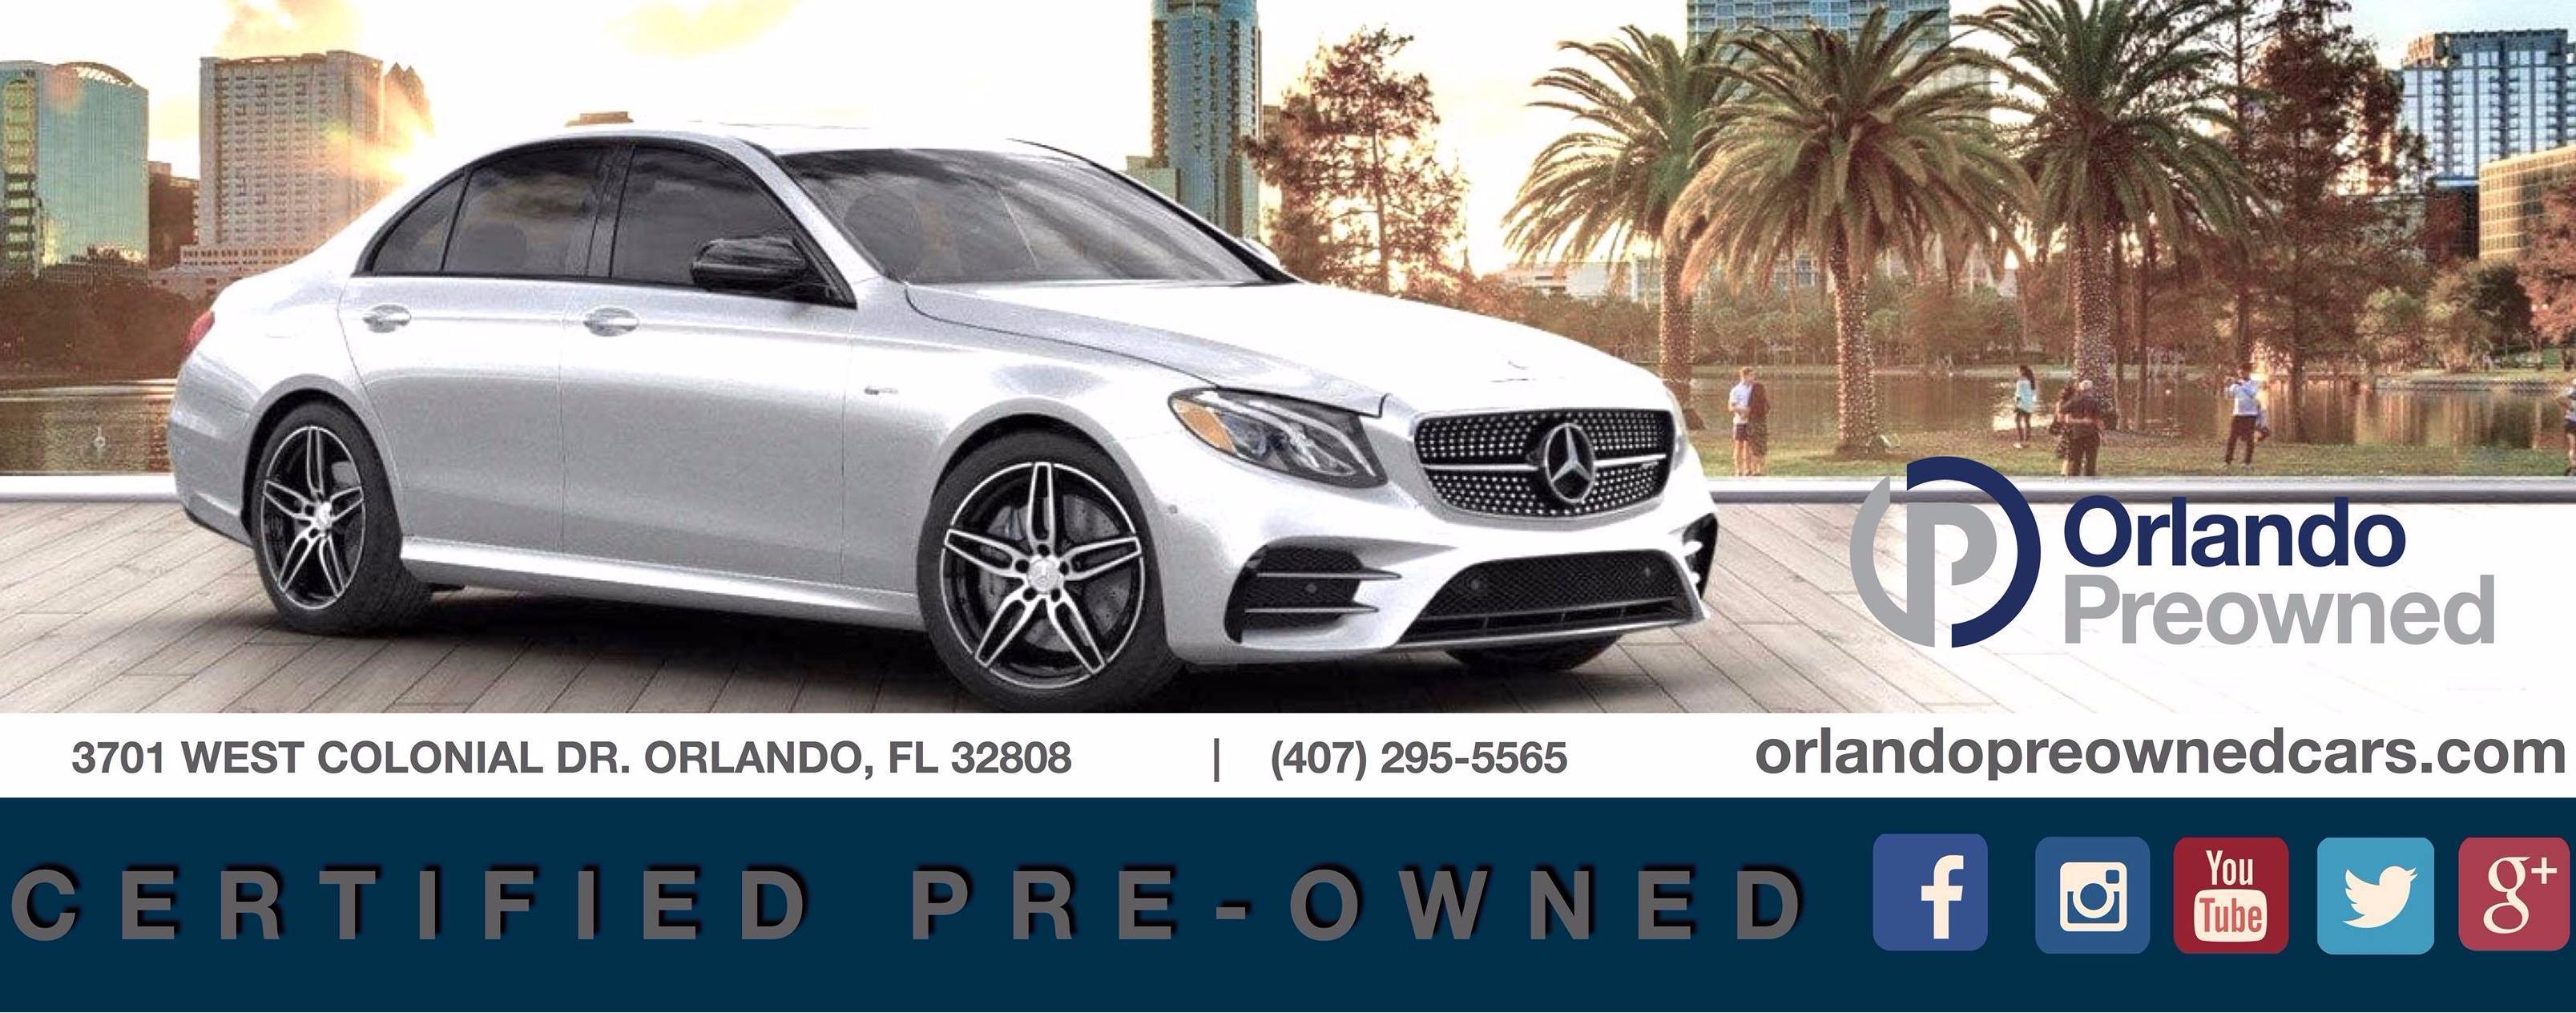 orlando preowned 3701 west colonial dr orlando fl auto dealers